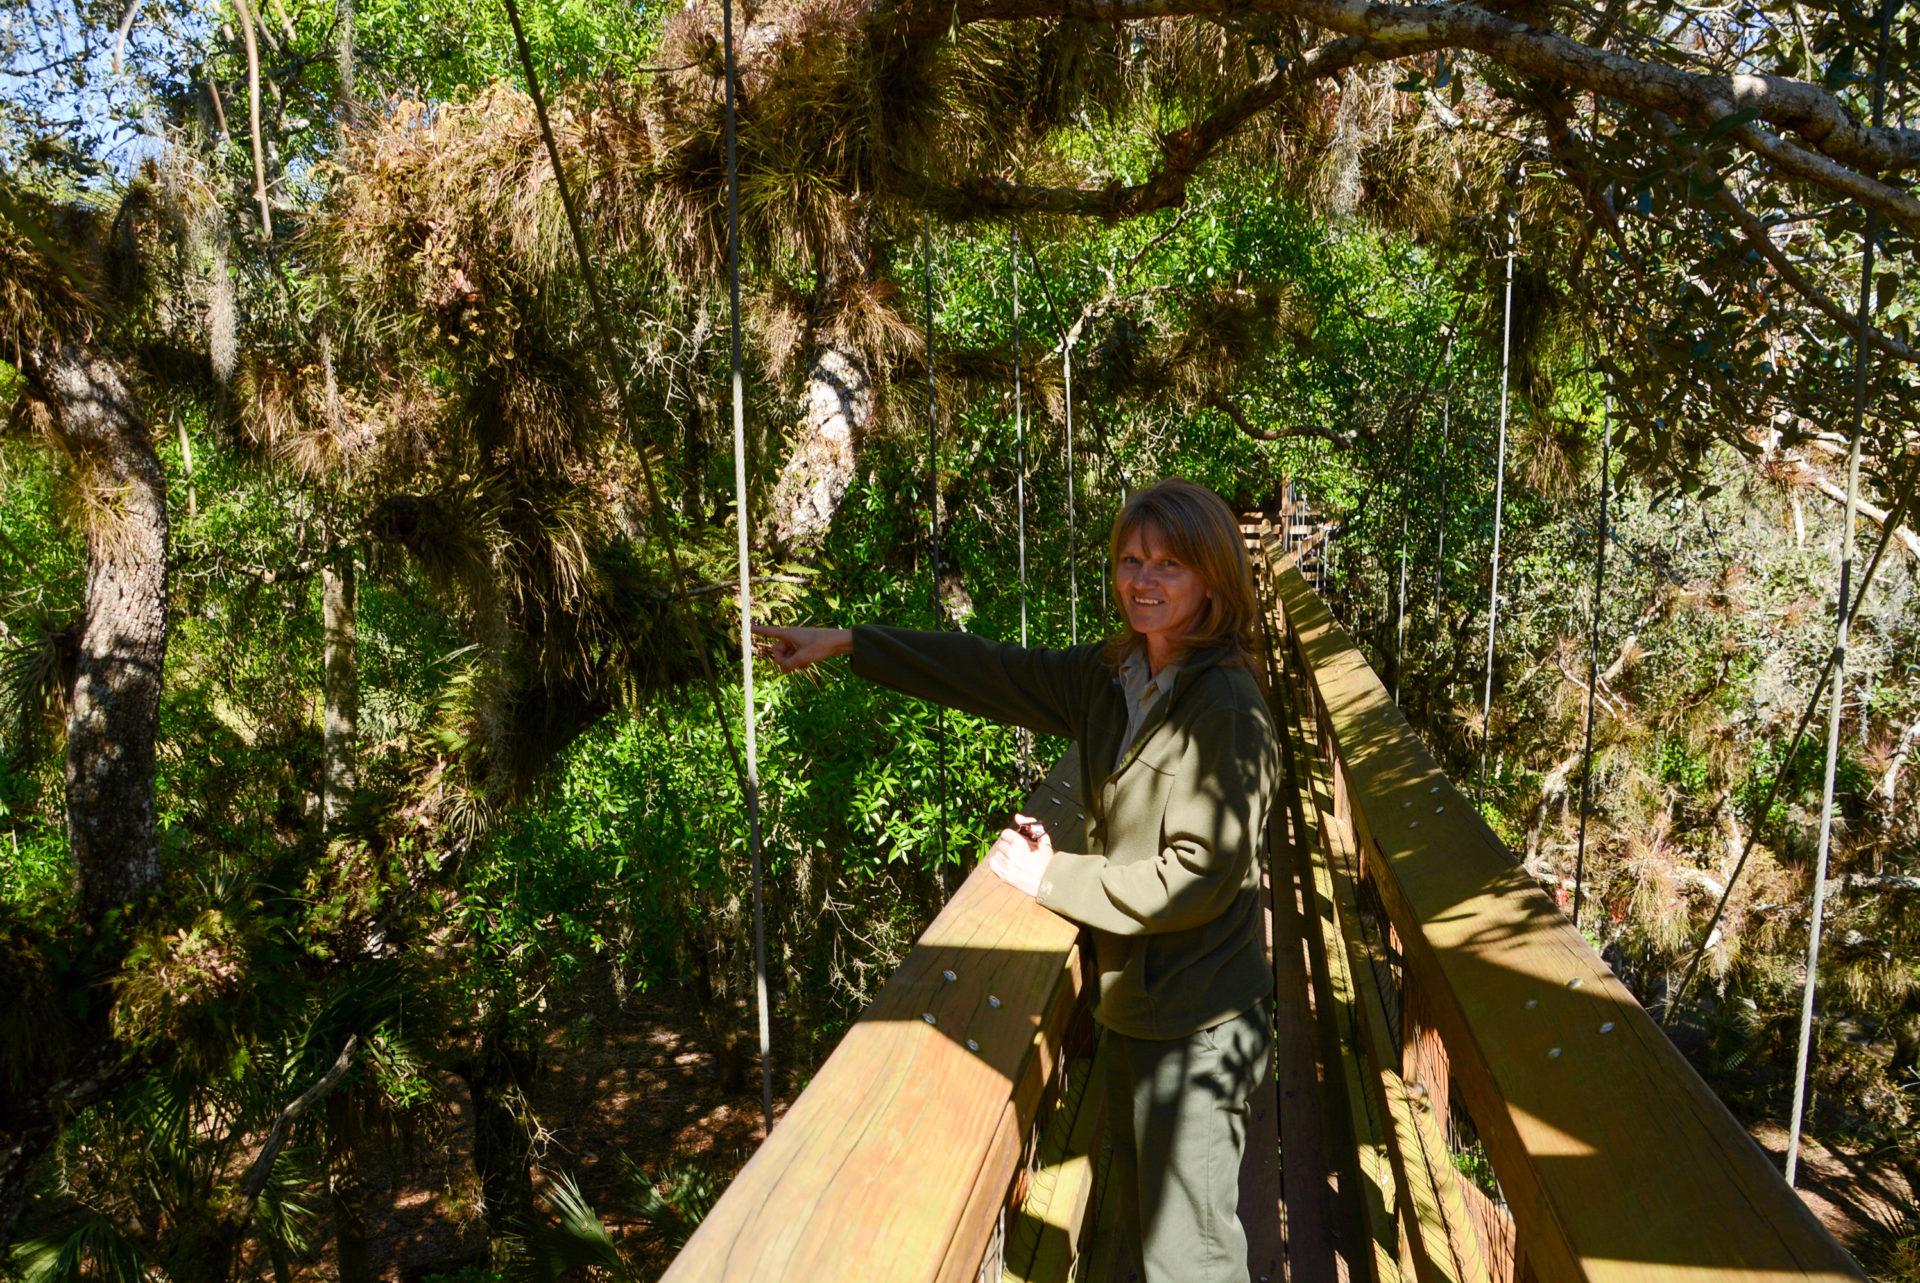 Parkrangerin Dorothy auf dem Canopy Walk am Myakka River